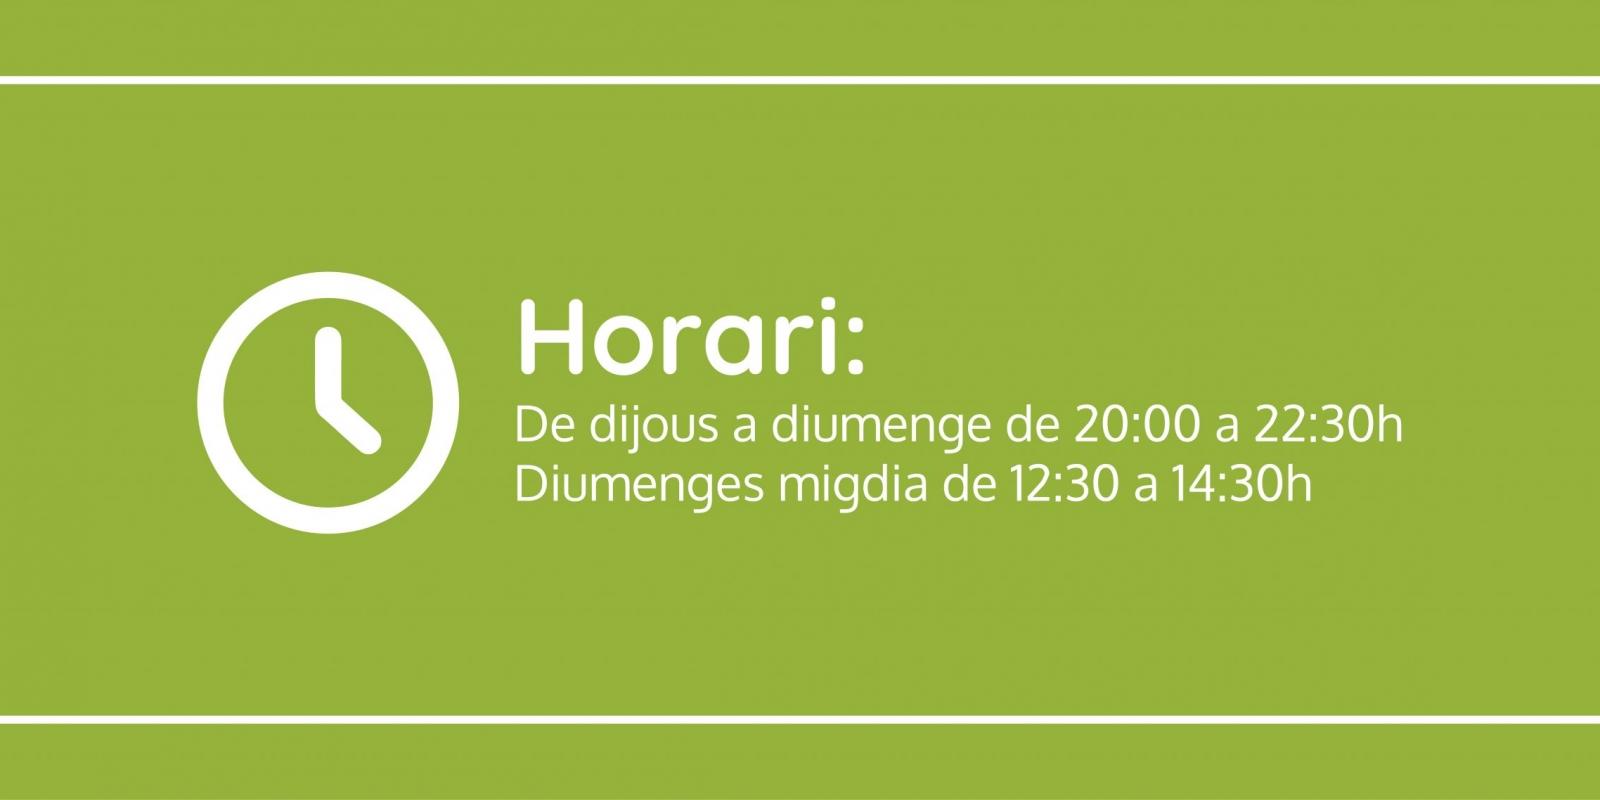 PT_HomeSlider_HorariPostConfinament-01